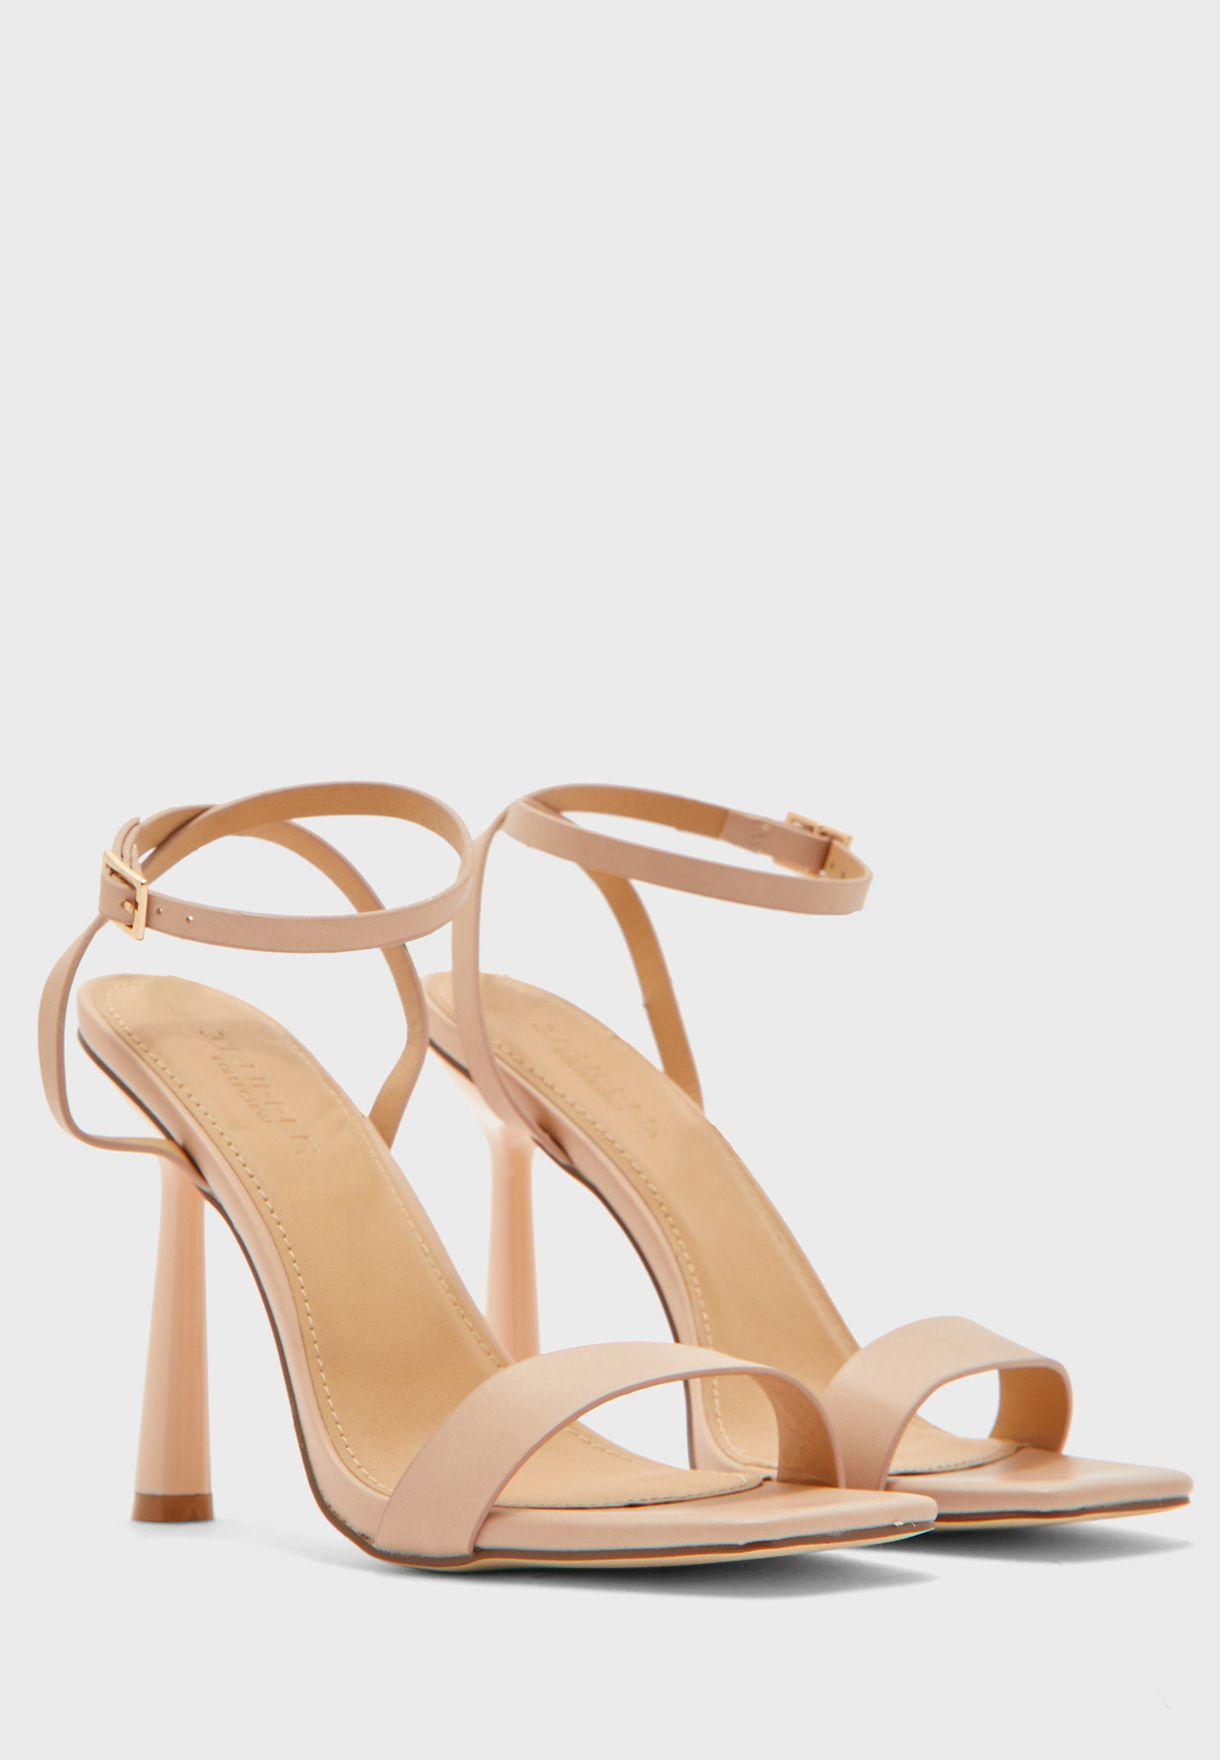 Square Toe Ankle Strap Sandal